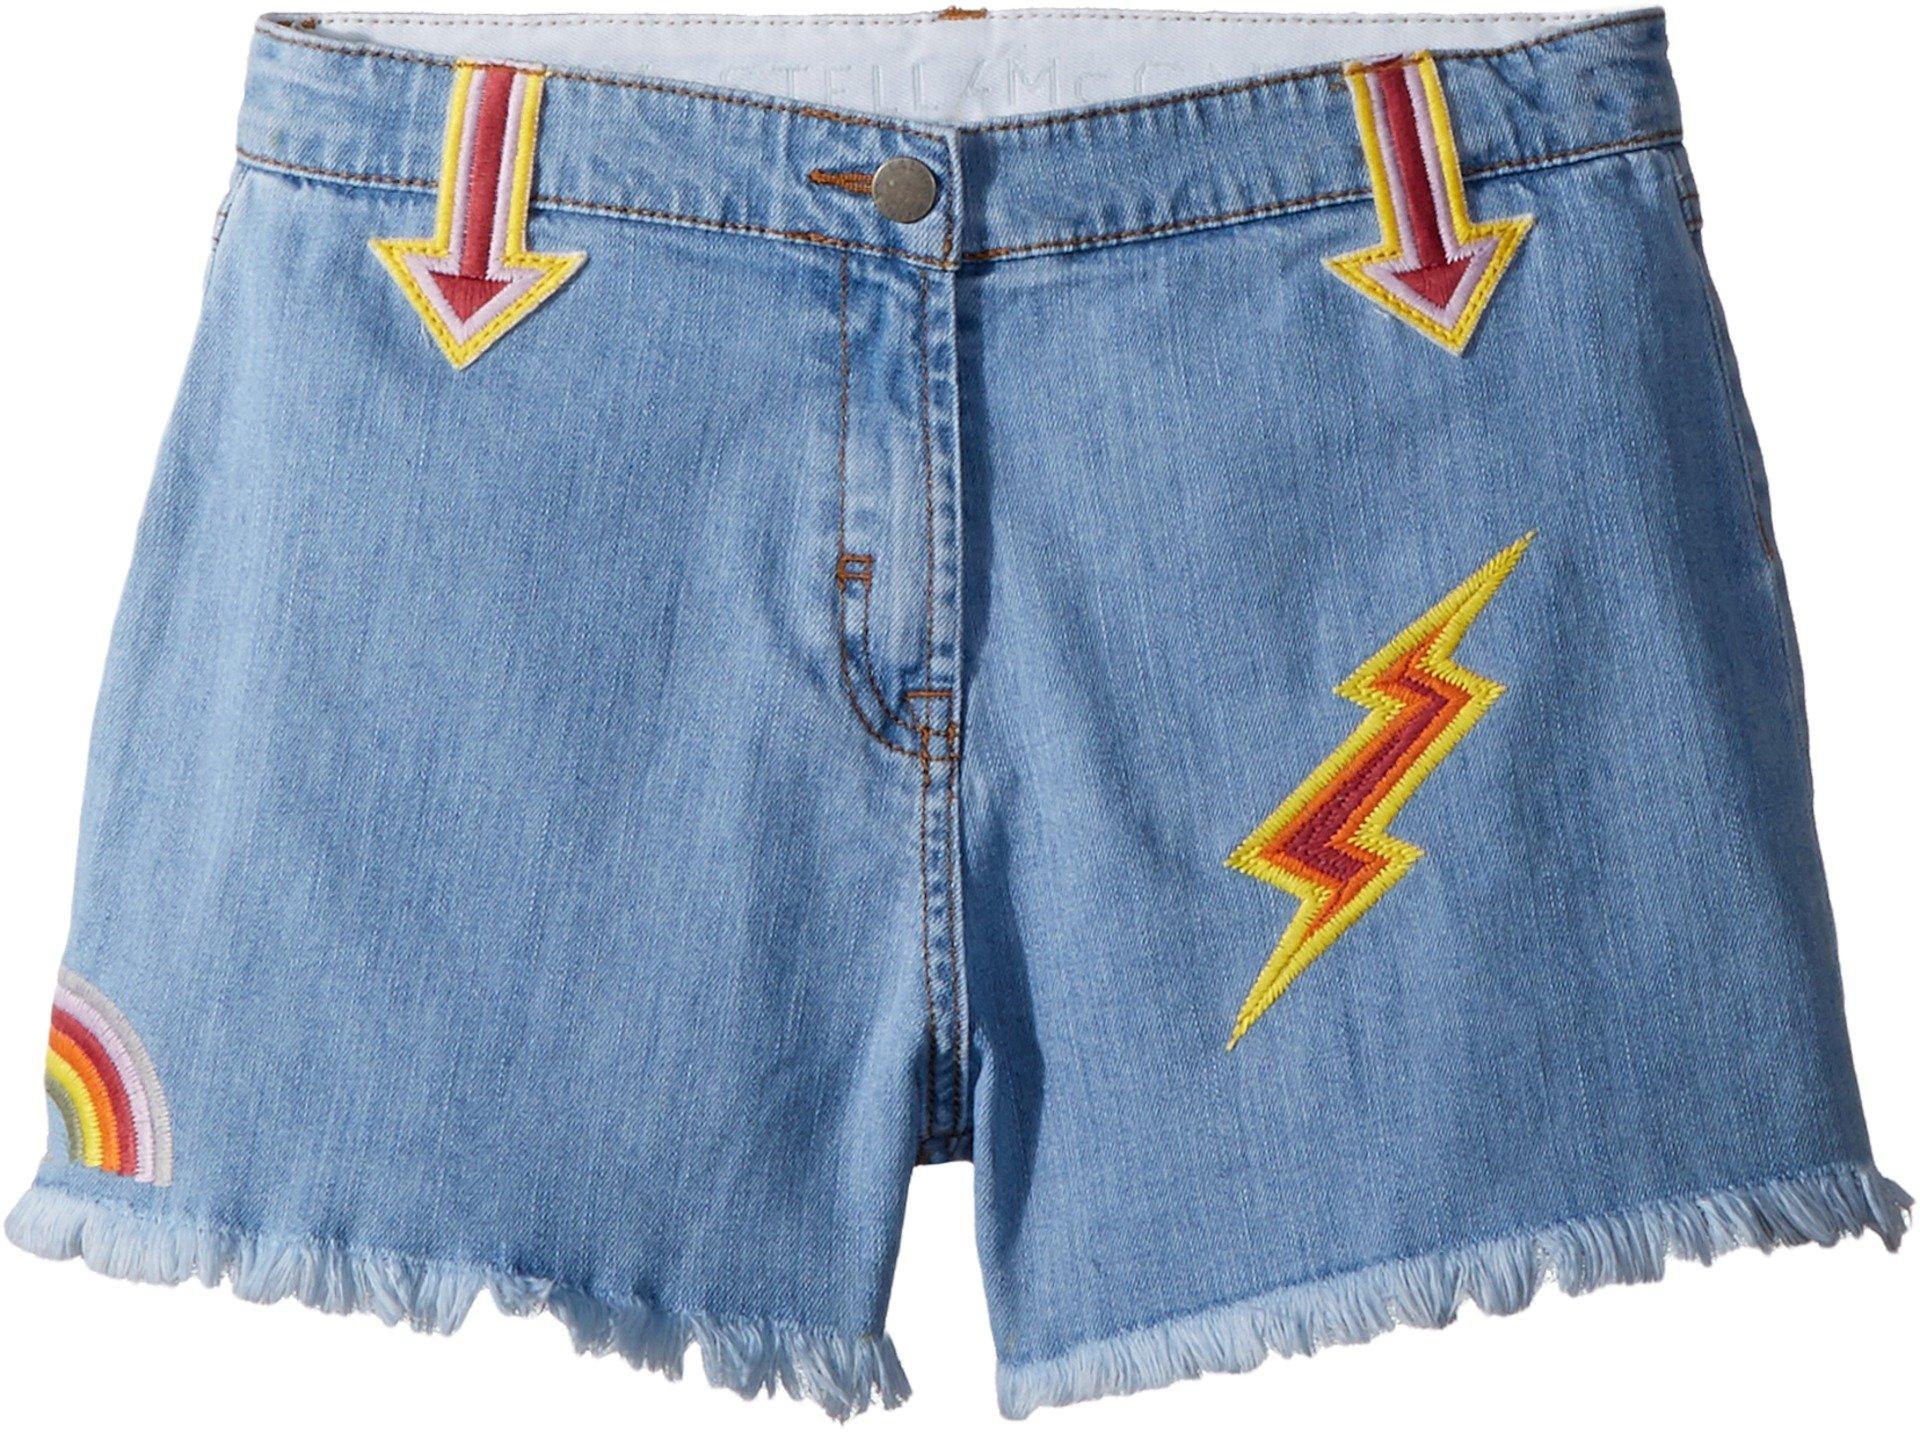 Stella McCartney Kids Baby Girl's Marlin Cut Off Denim Shorts w/Patches (Toddler/Little Kids/Big Kids) Blue 4T